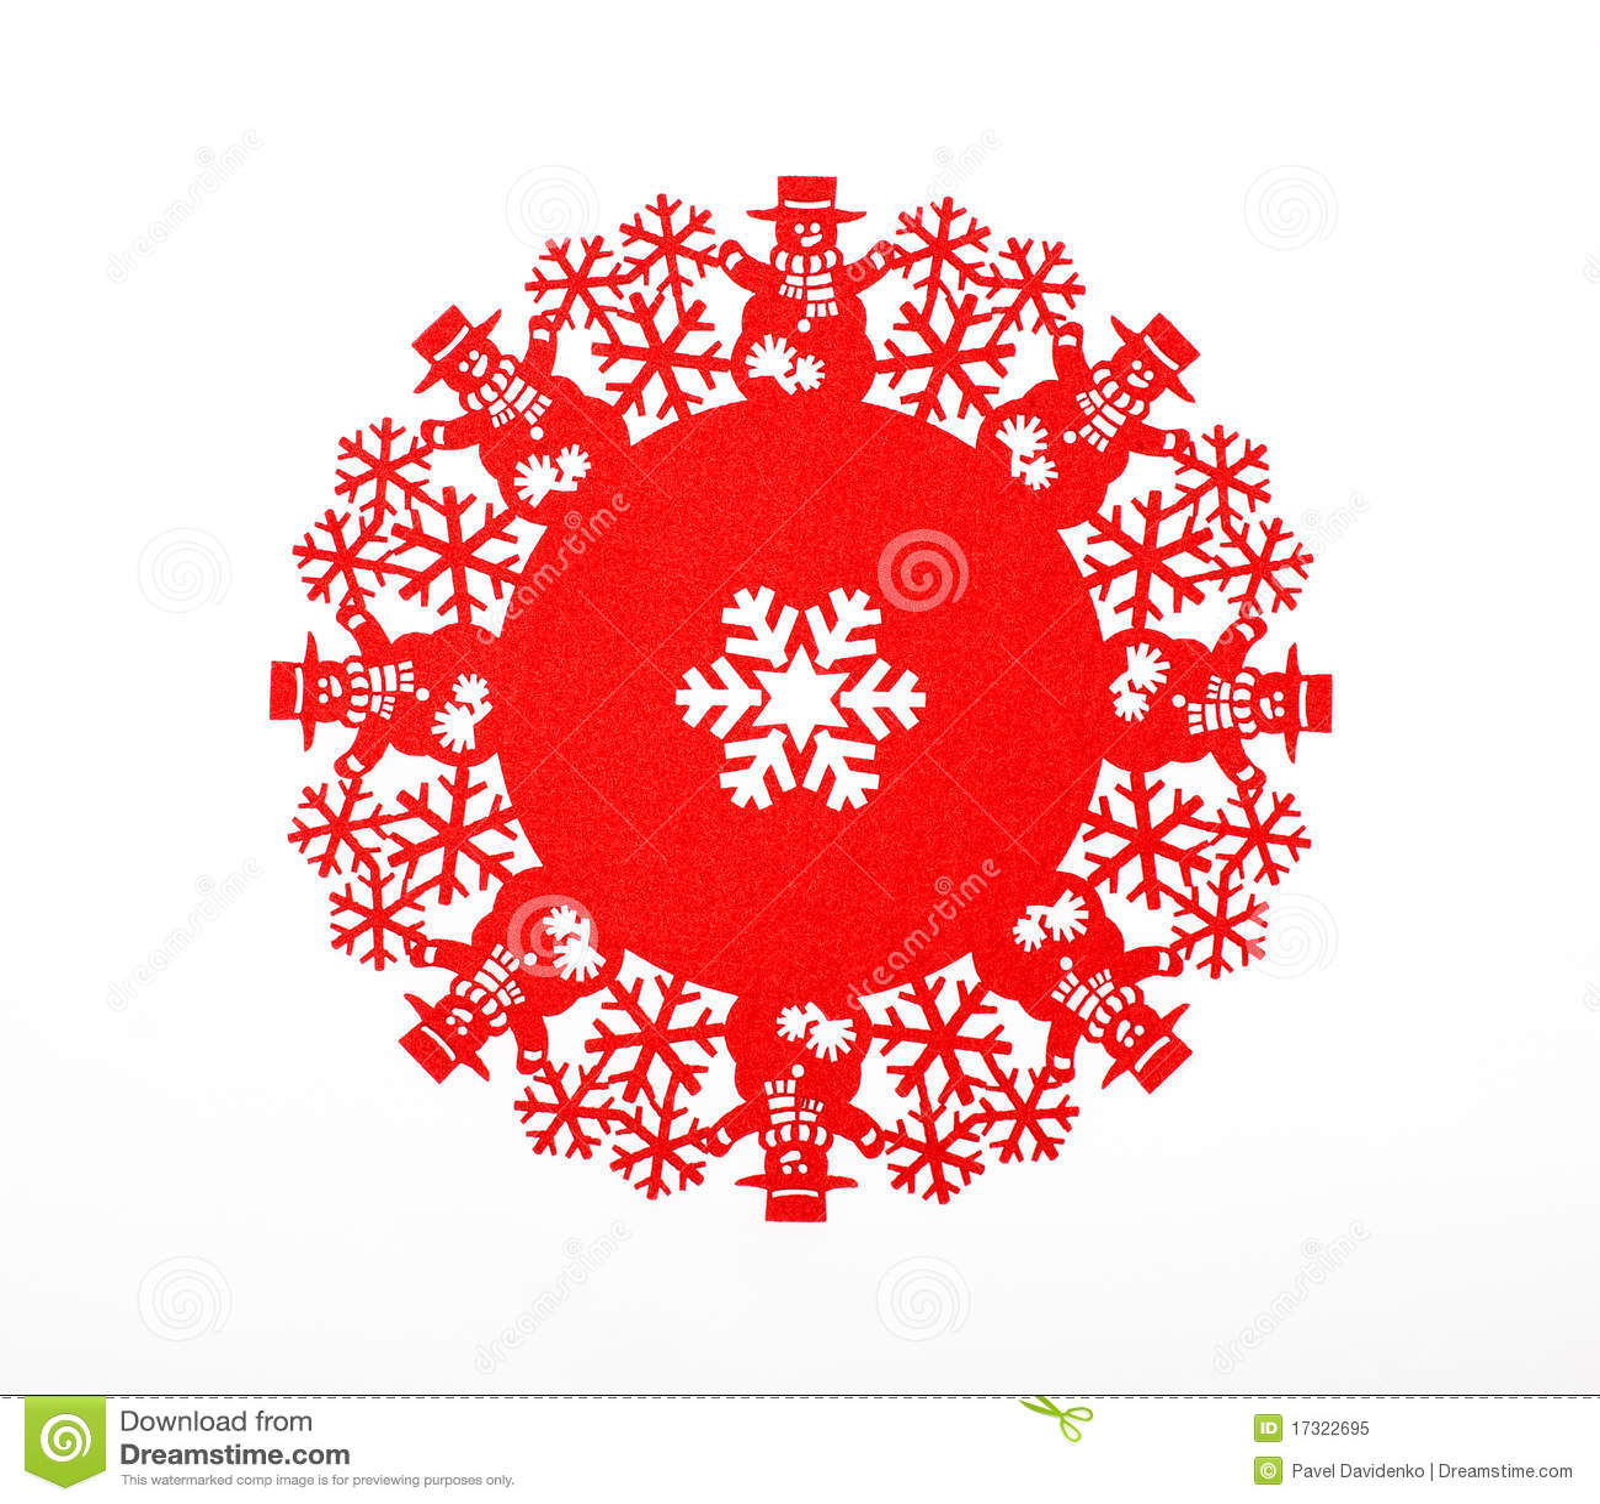 Red Snowflake Royalty Free Stock Photo - Image: 17322695